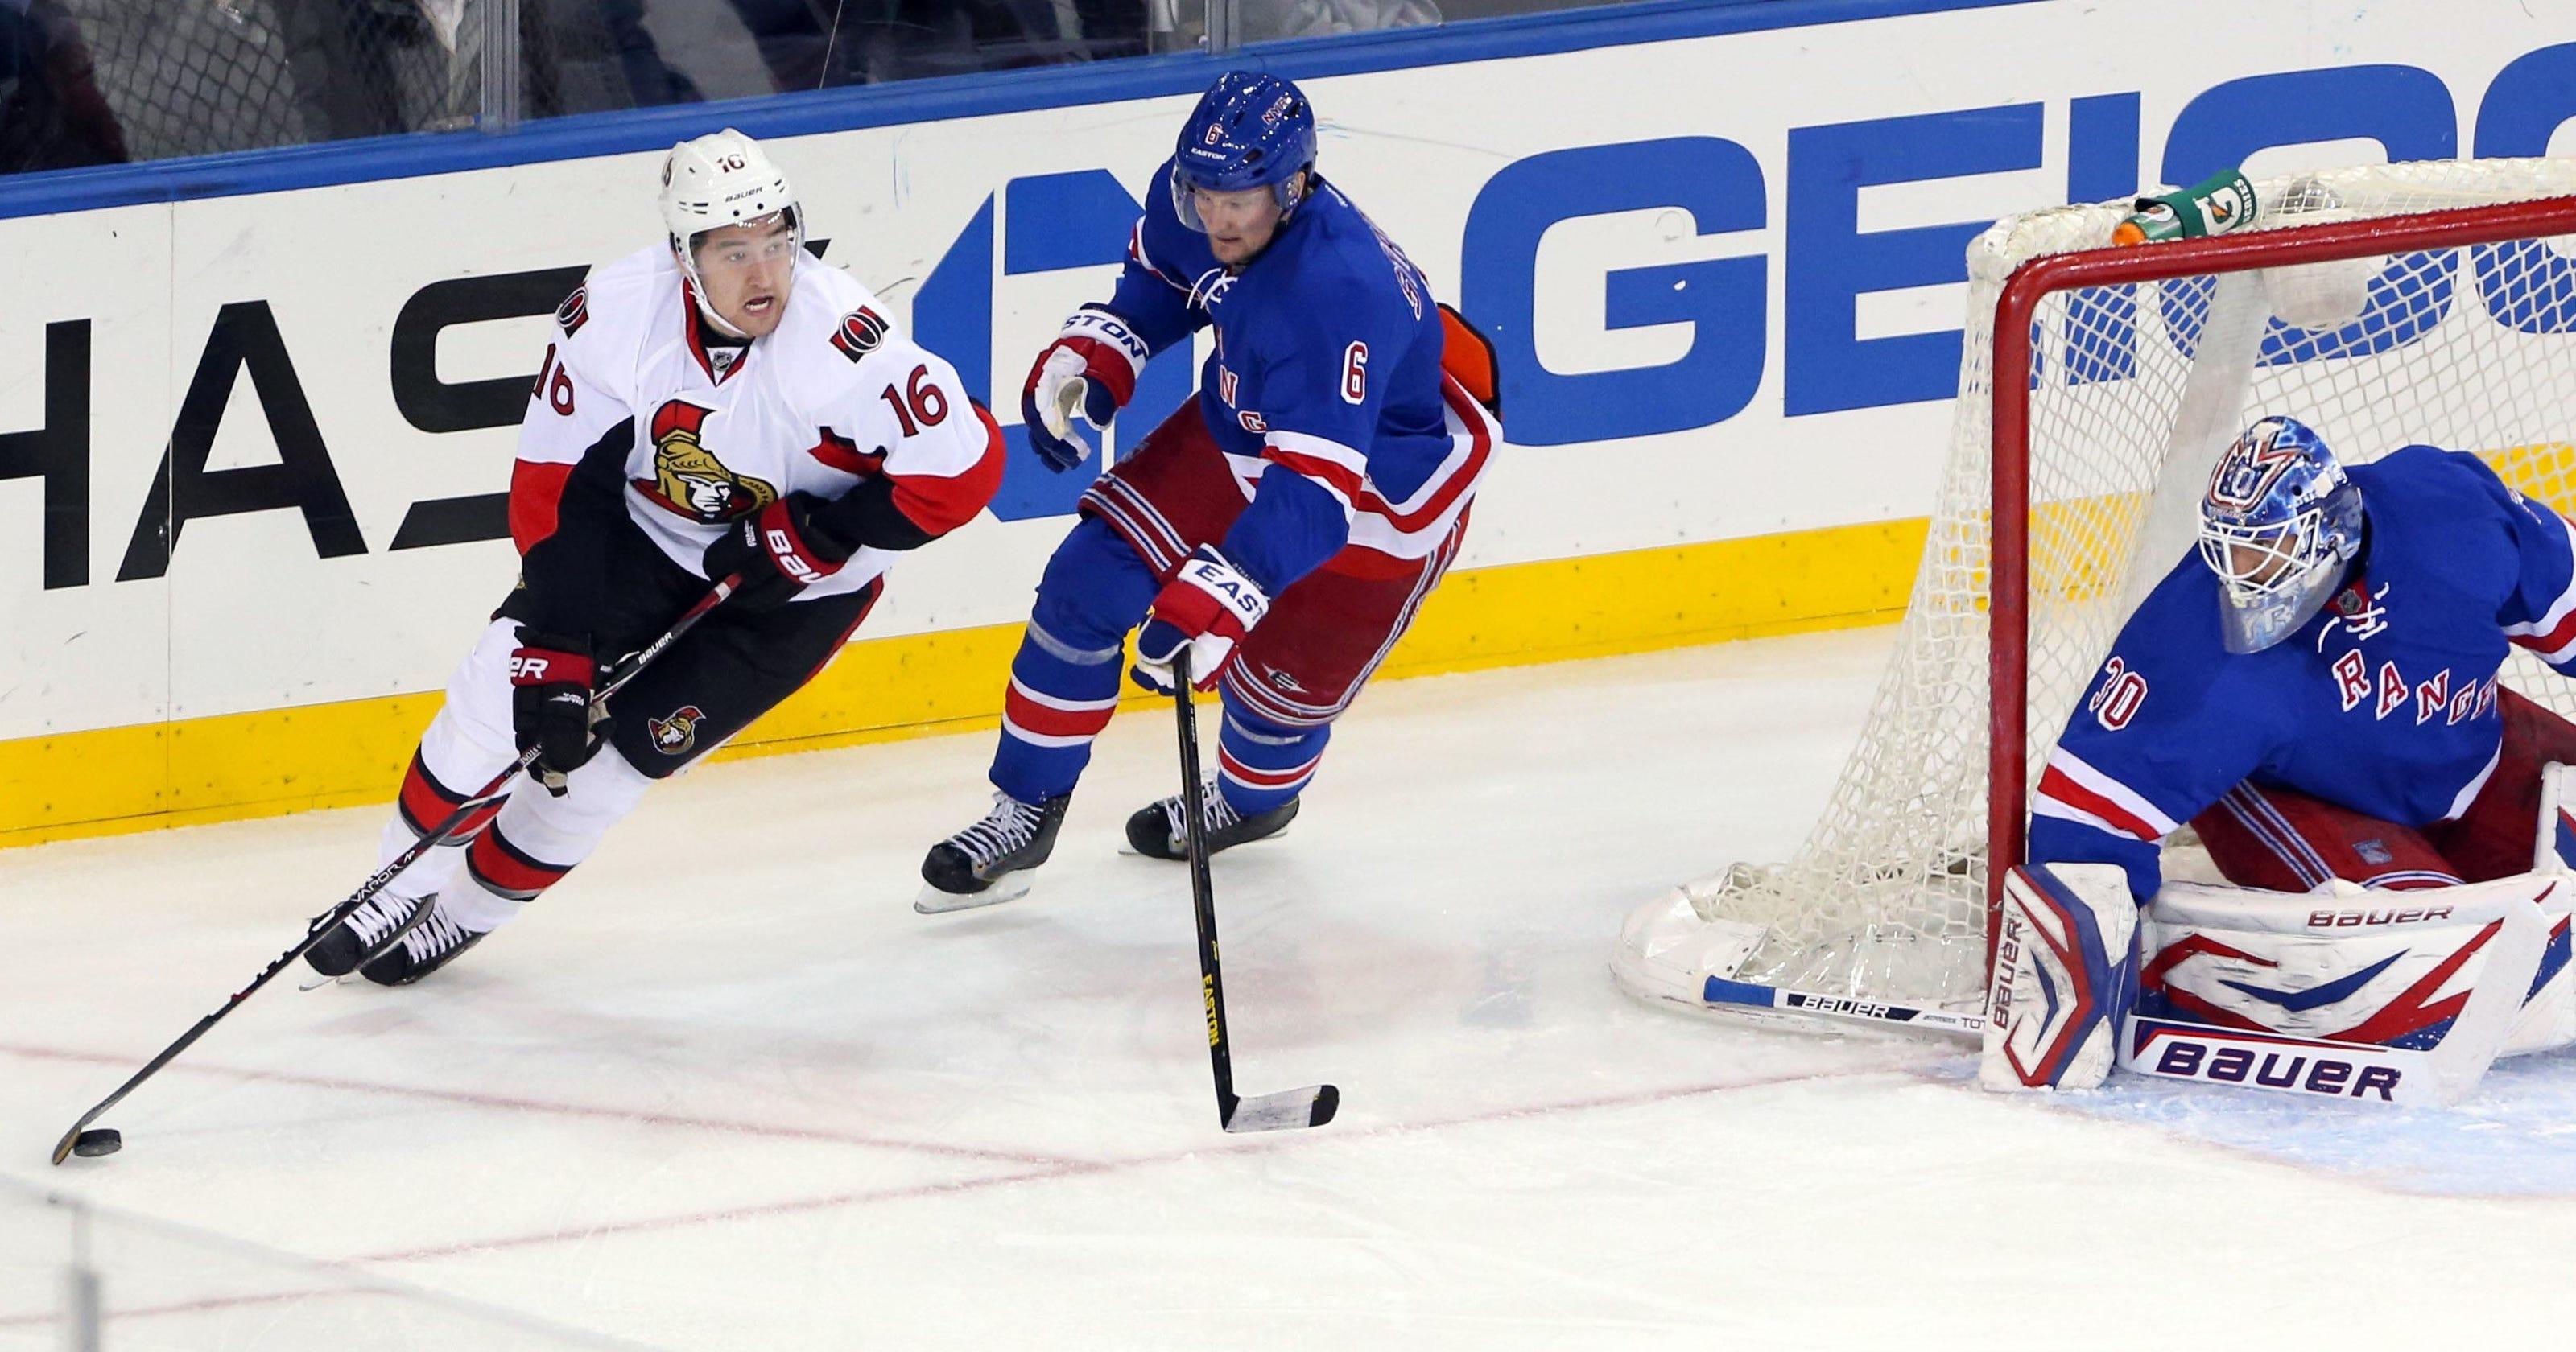 ca272a02d Late goal lifts Ottawa Senators over New York Rangers